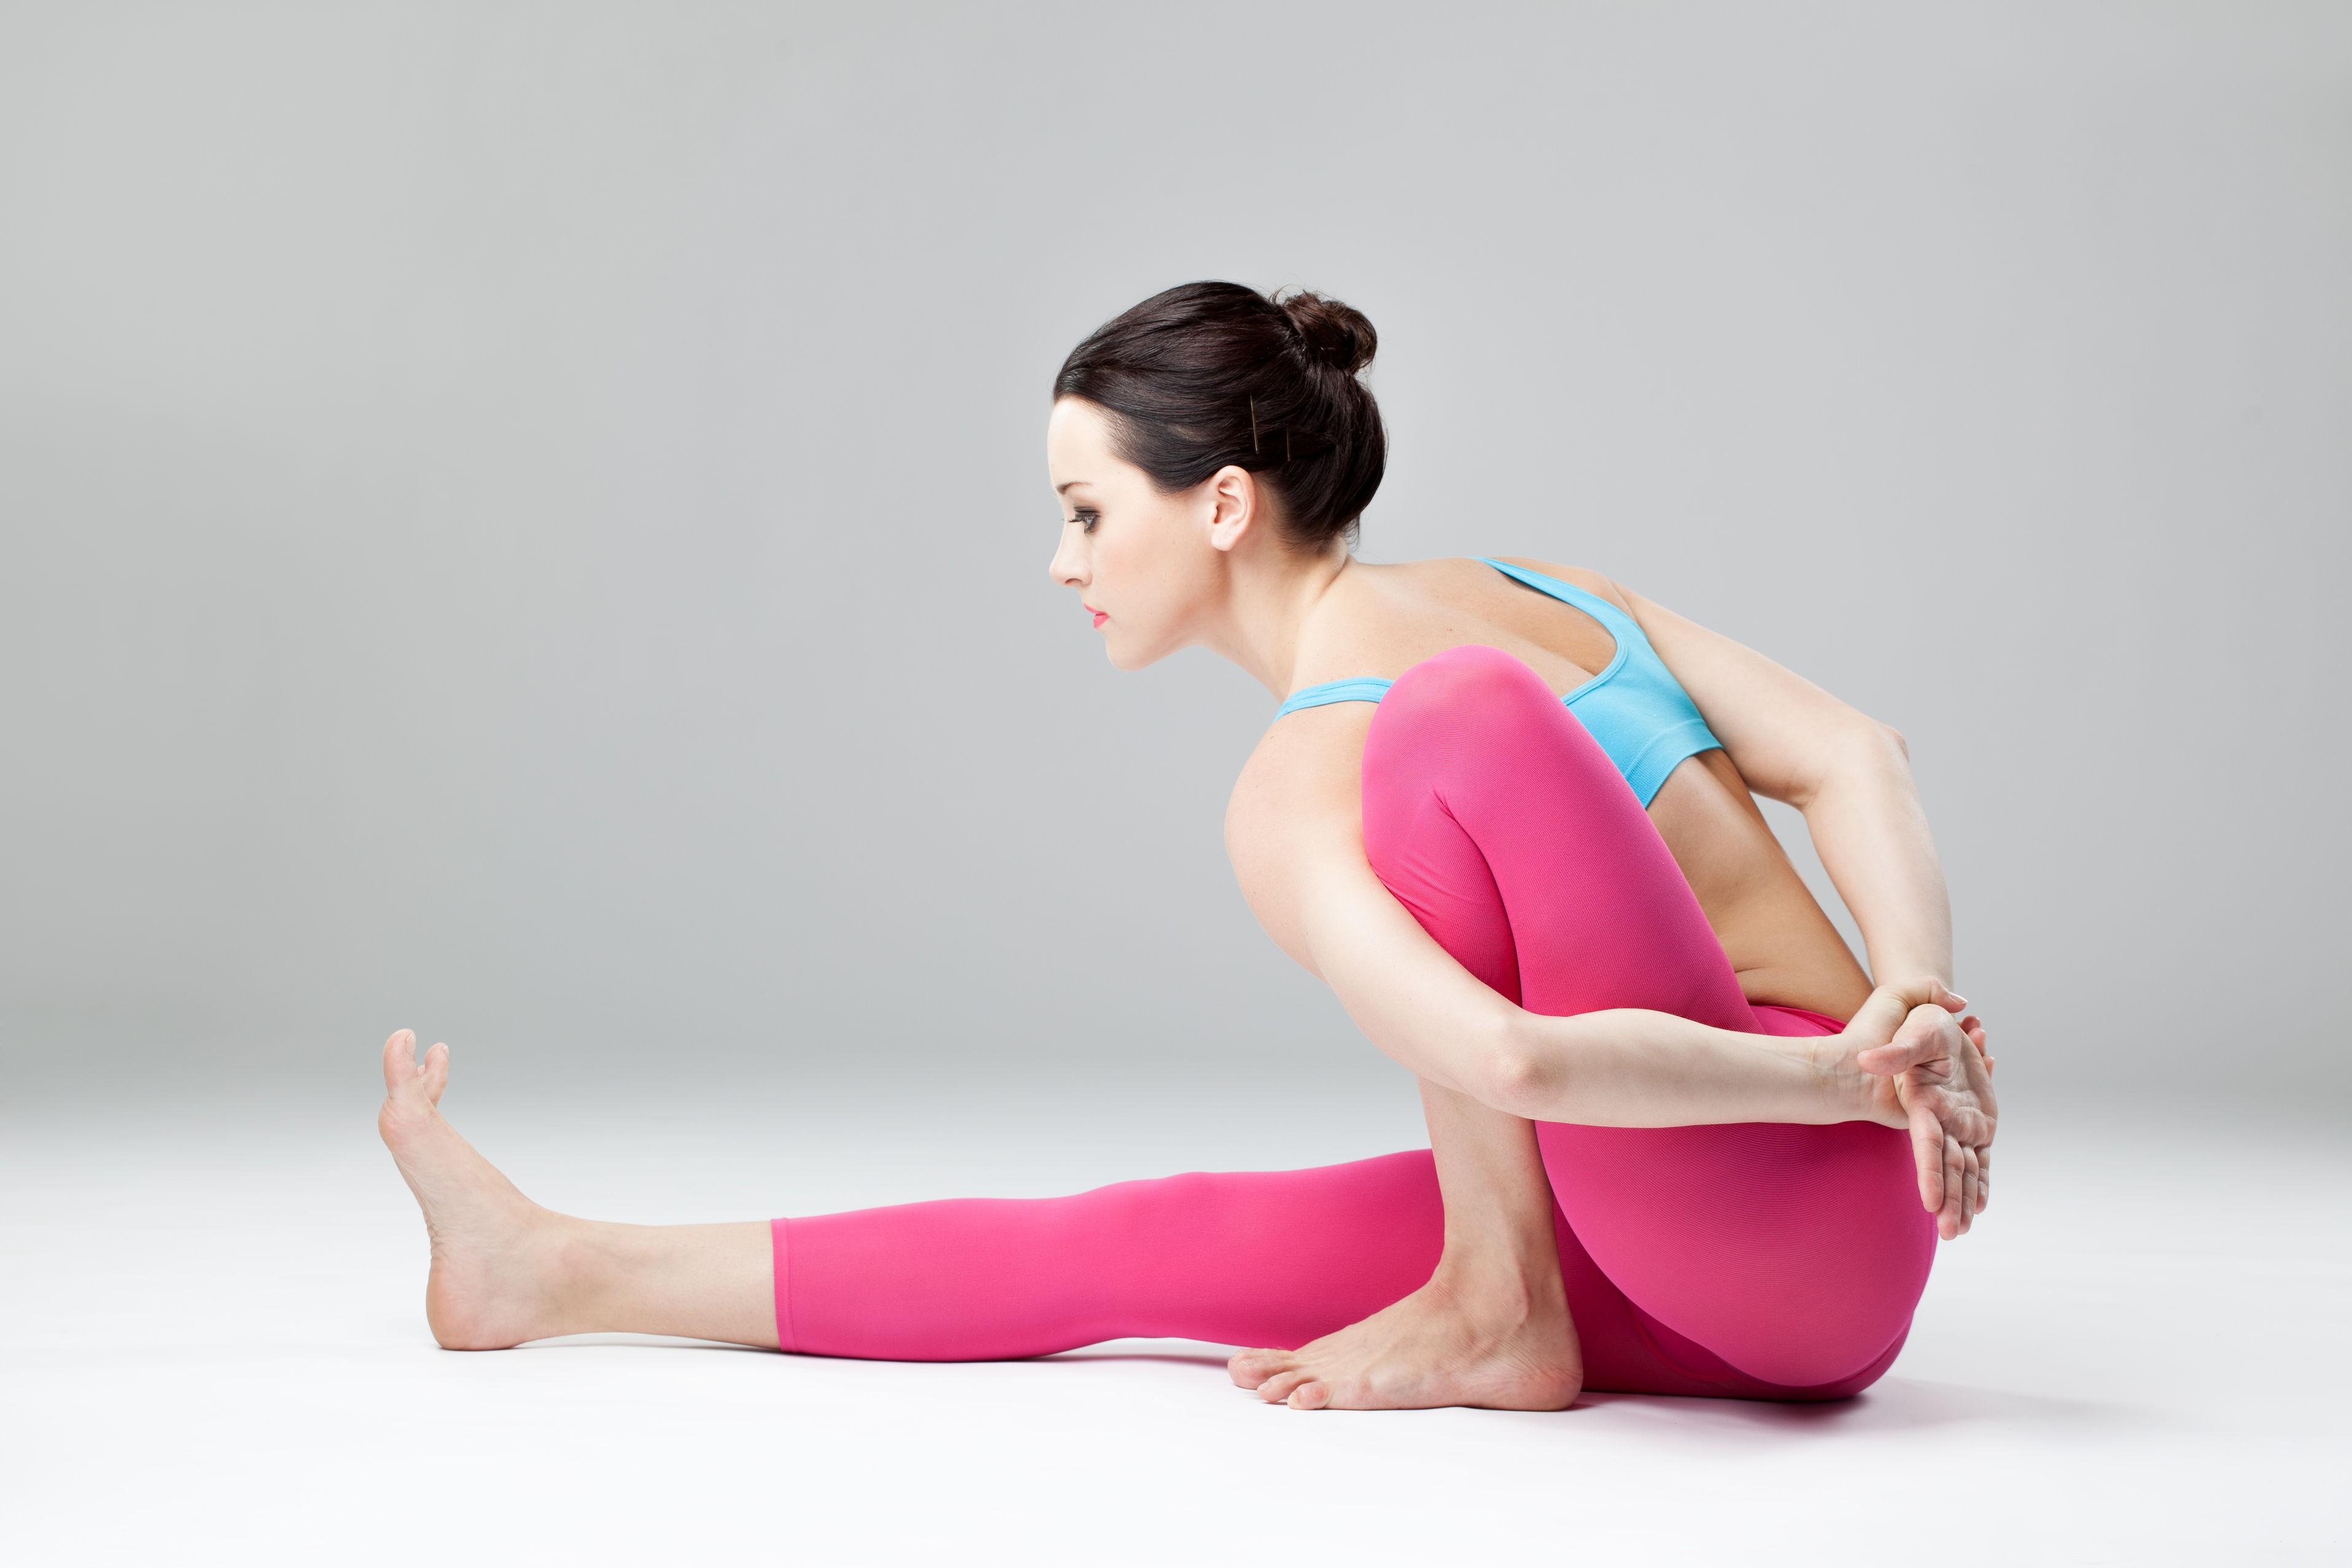 Wallpaper yoga, weight loss, relax, Fitness, Sport #11089